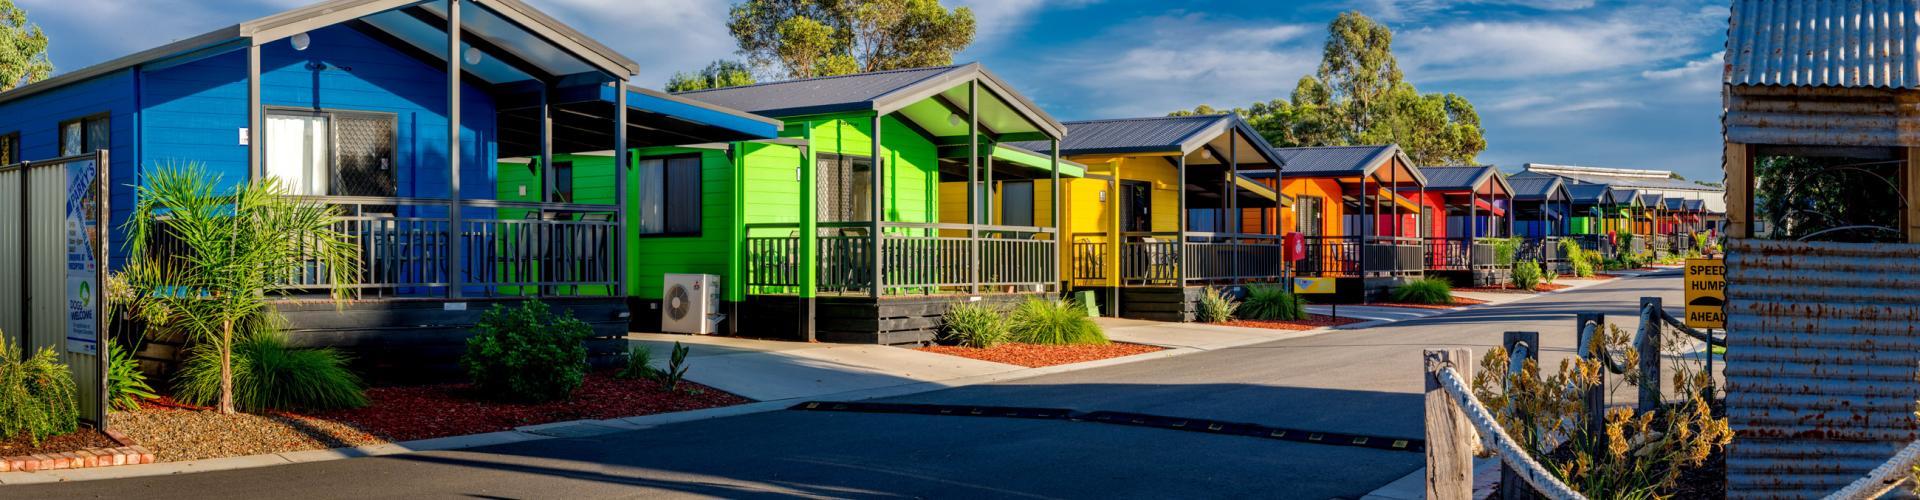 BIG4 Bendigo Park Lane Holiday Park - Cabin Accommodation